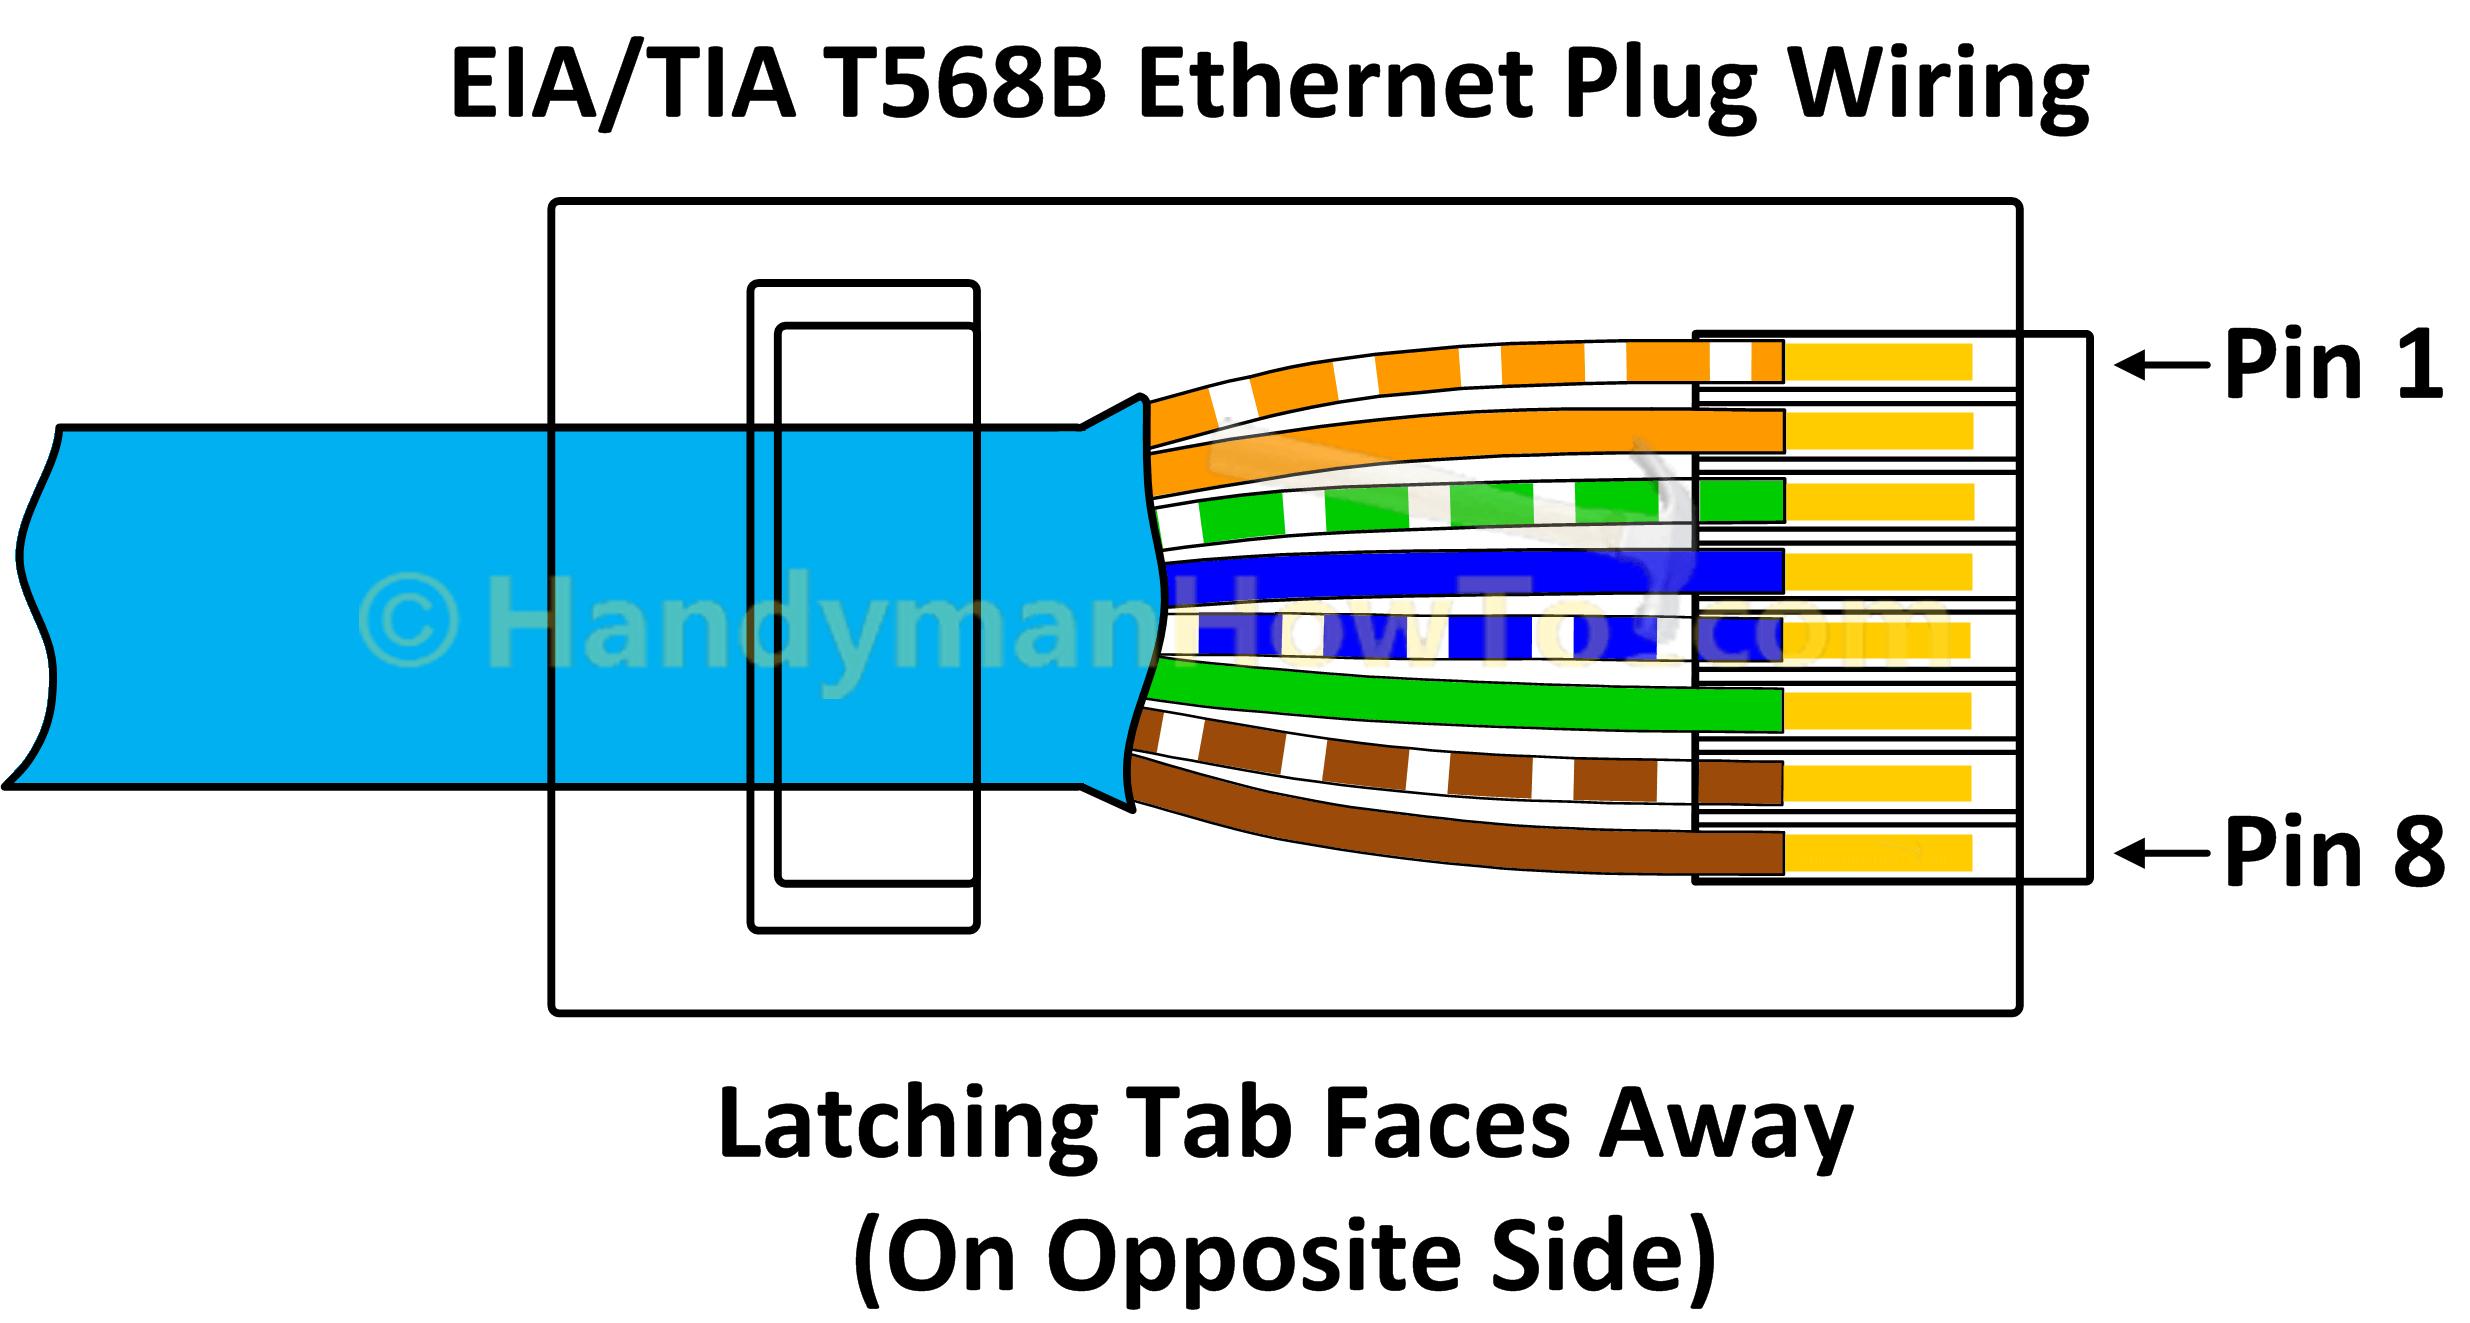 How To Wire A Cat6 Rj45 Ethernet Plug - Handymanhowto - Wiring A Plug Diagram